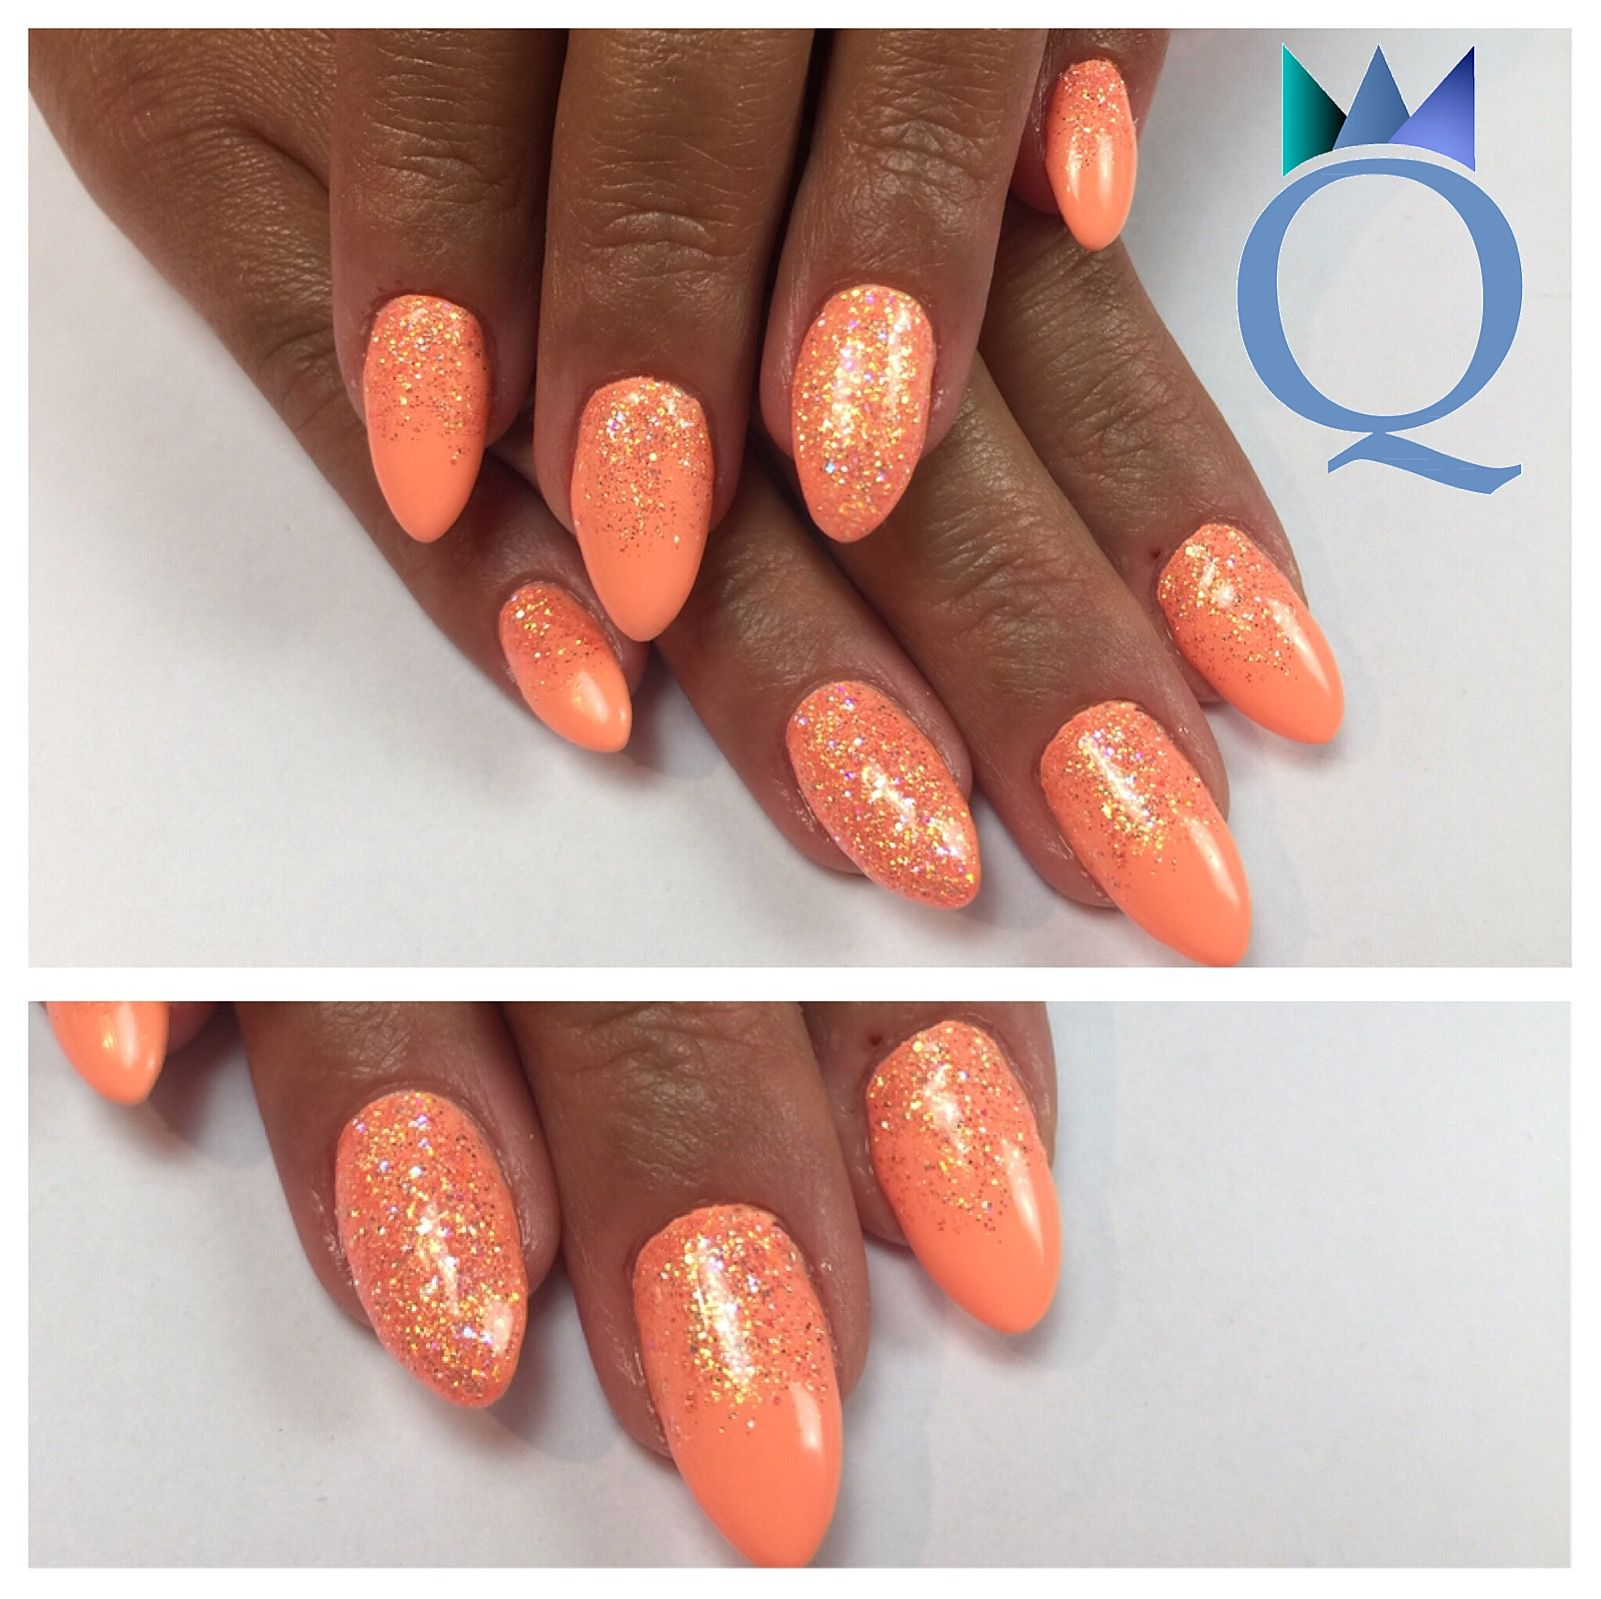 almondnails #gelnails #nails #neonpeach #glitter #mandelform ...